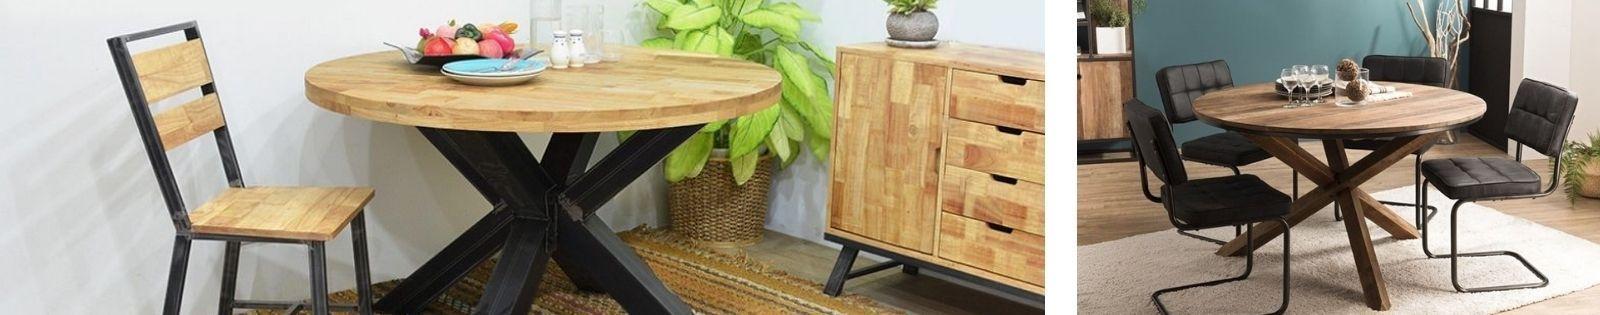 Table de repas ronde en bois massif : acacia, chêne, hévéa, teck, manguier